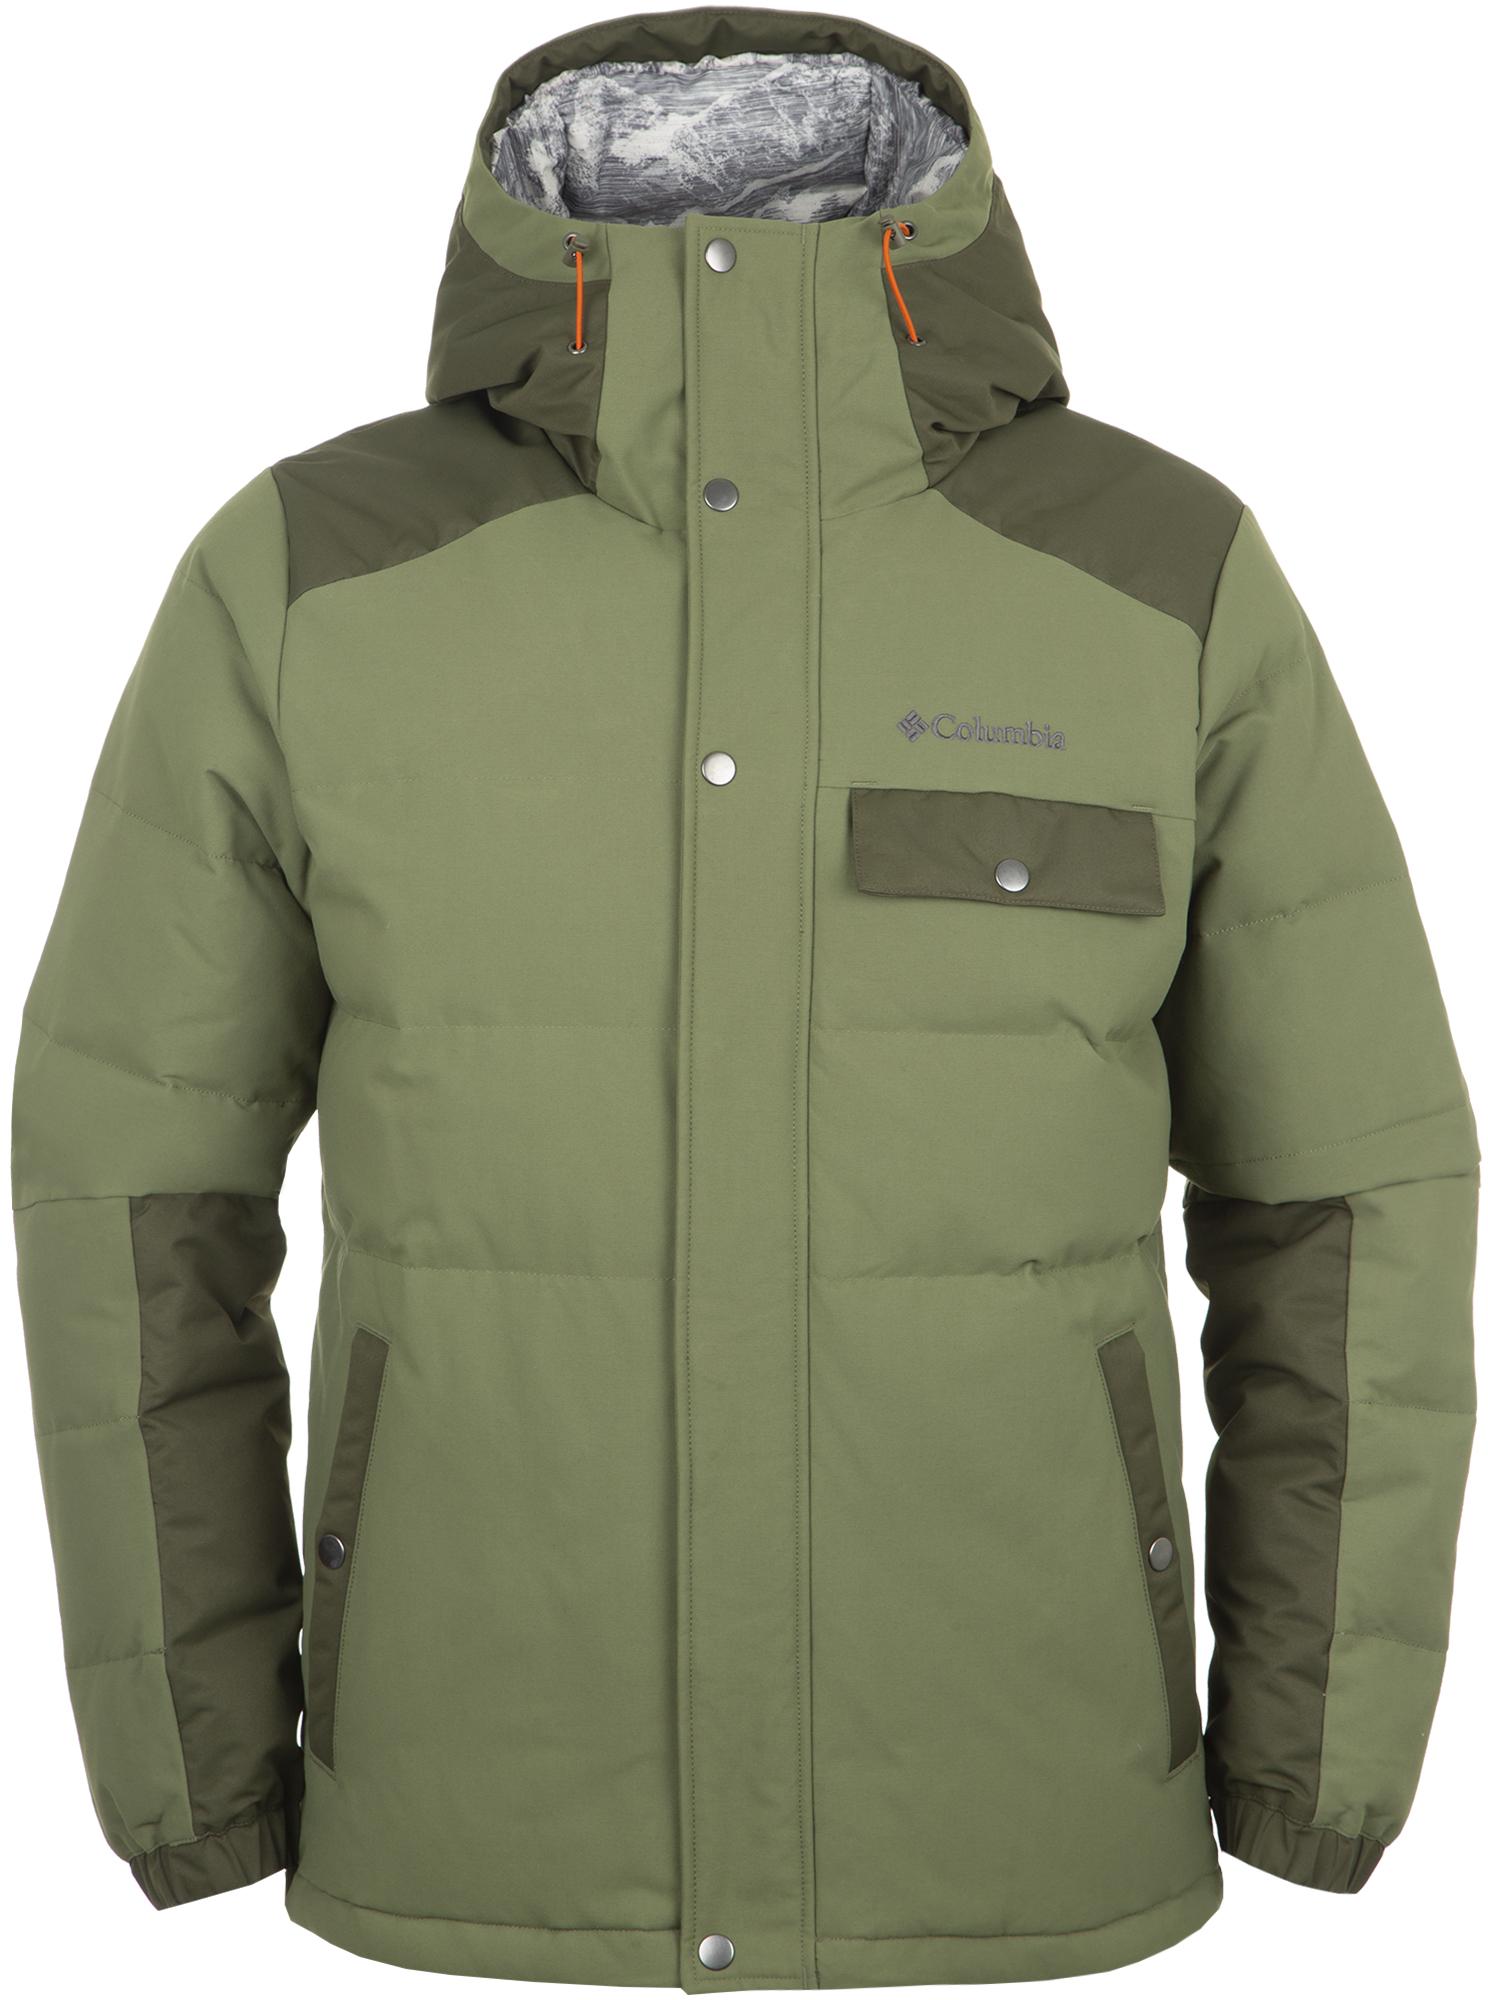 Columbia Куртка пуховая мужская Columbia Winter Challenger, размер 48-50 цена